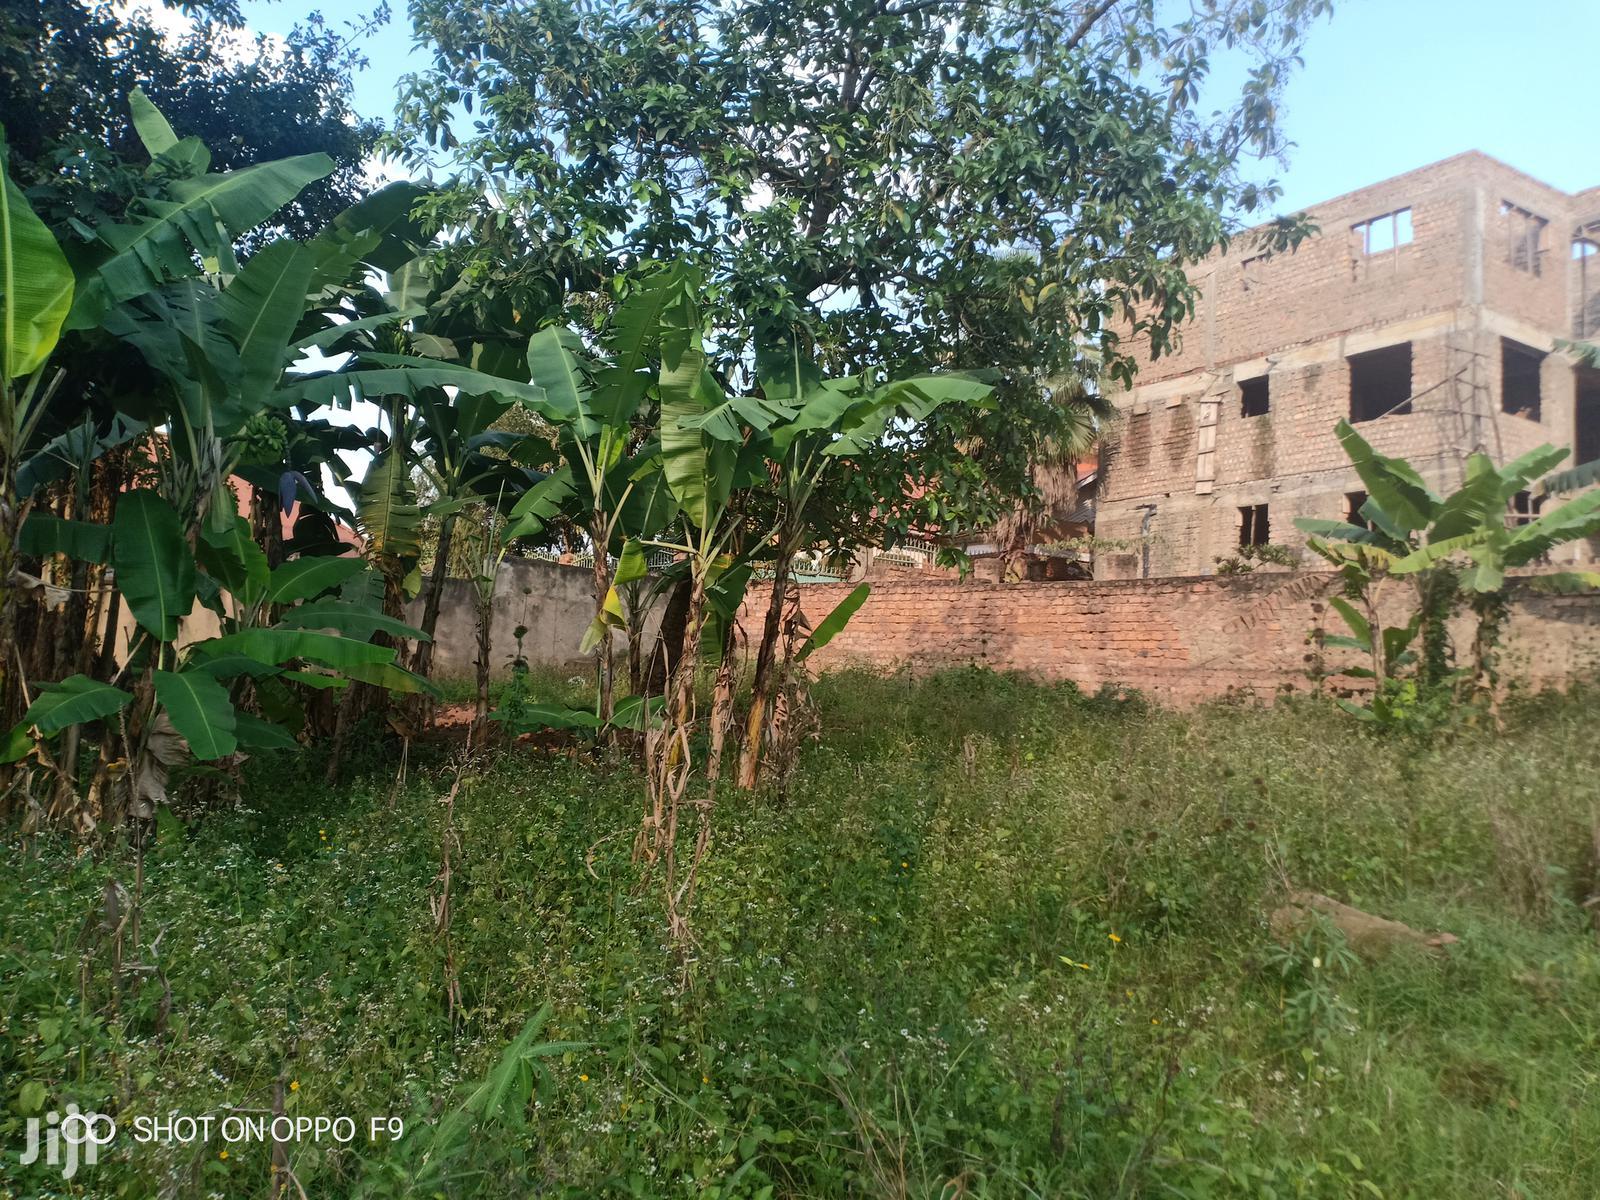 Kireka Agenda 50 by 100 Plot for Sale | Land & Plots For Sale for sale in Kampala, Central Region, Uganda